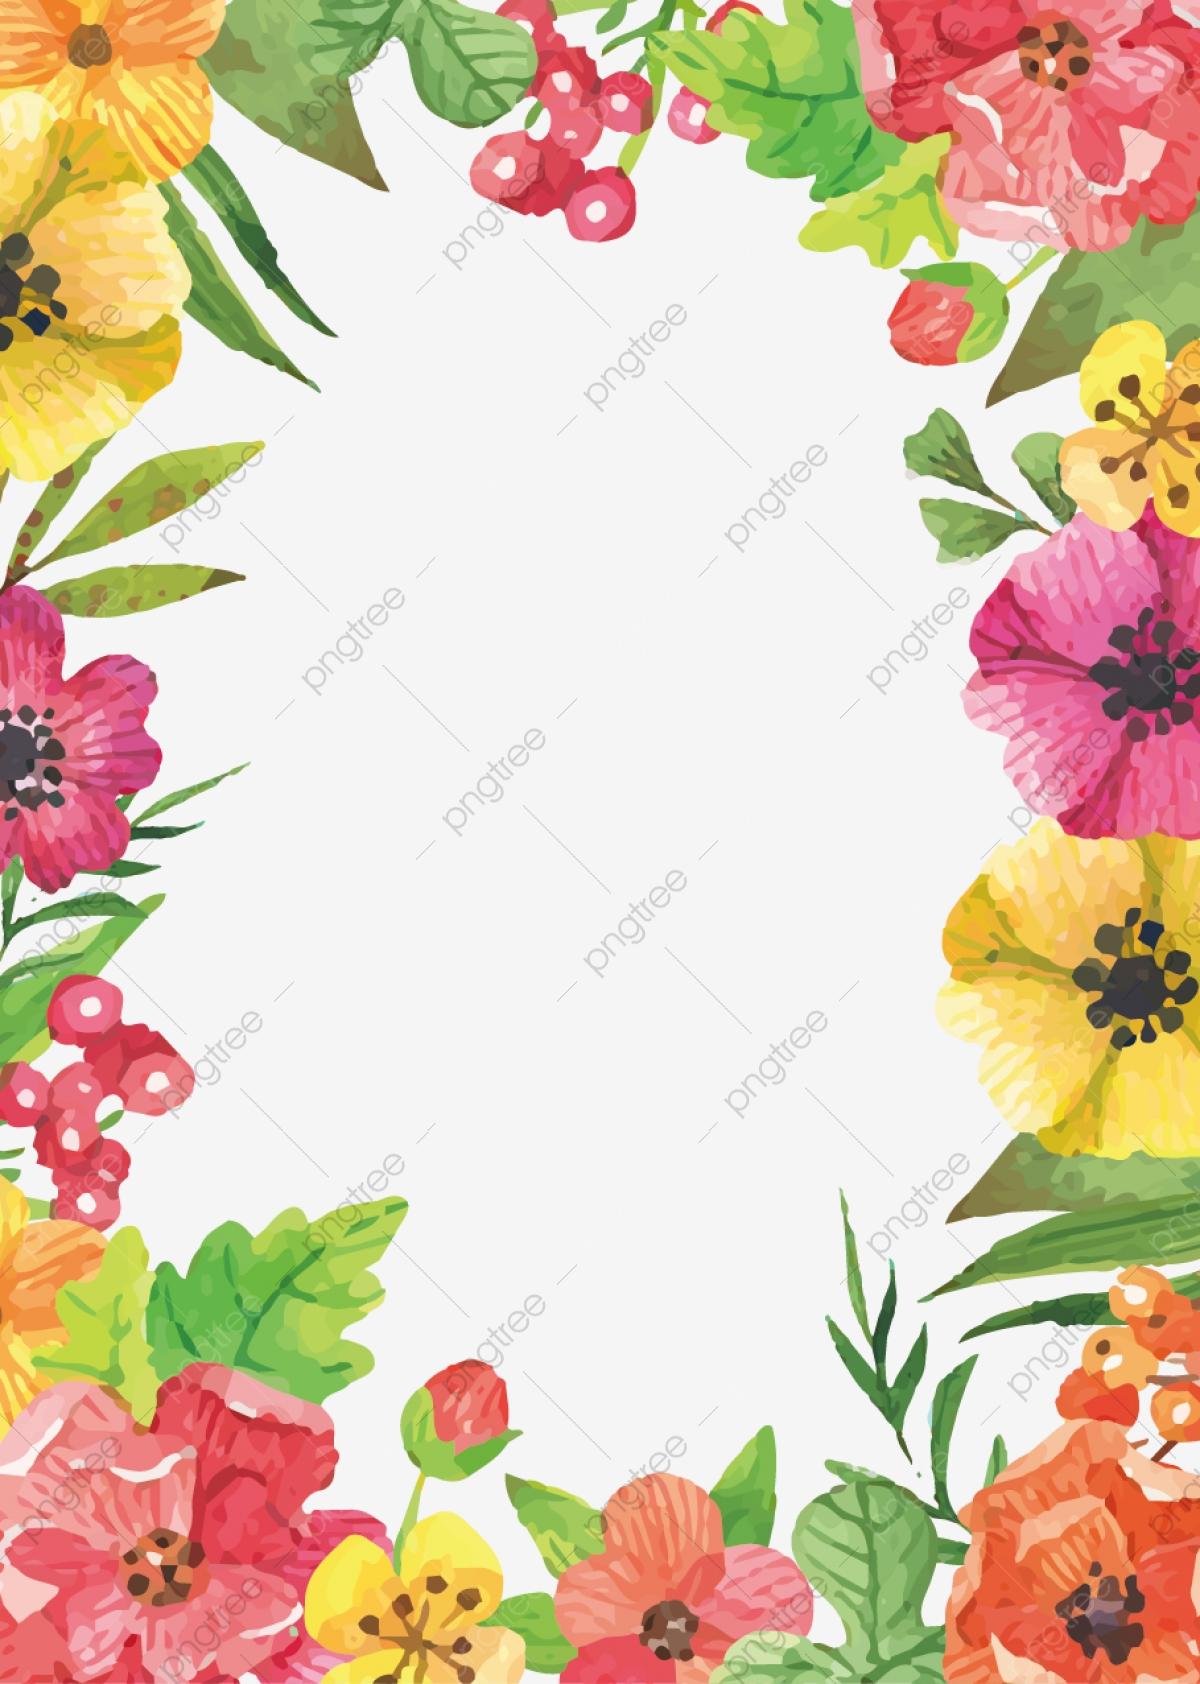 Watercolor Flowers Frontera, Watercolor Flowers Vector, Vector.